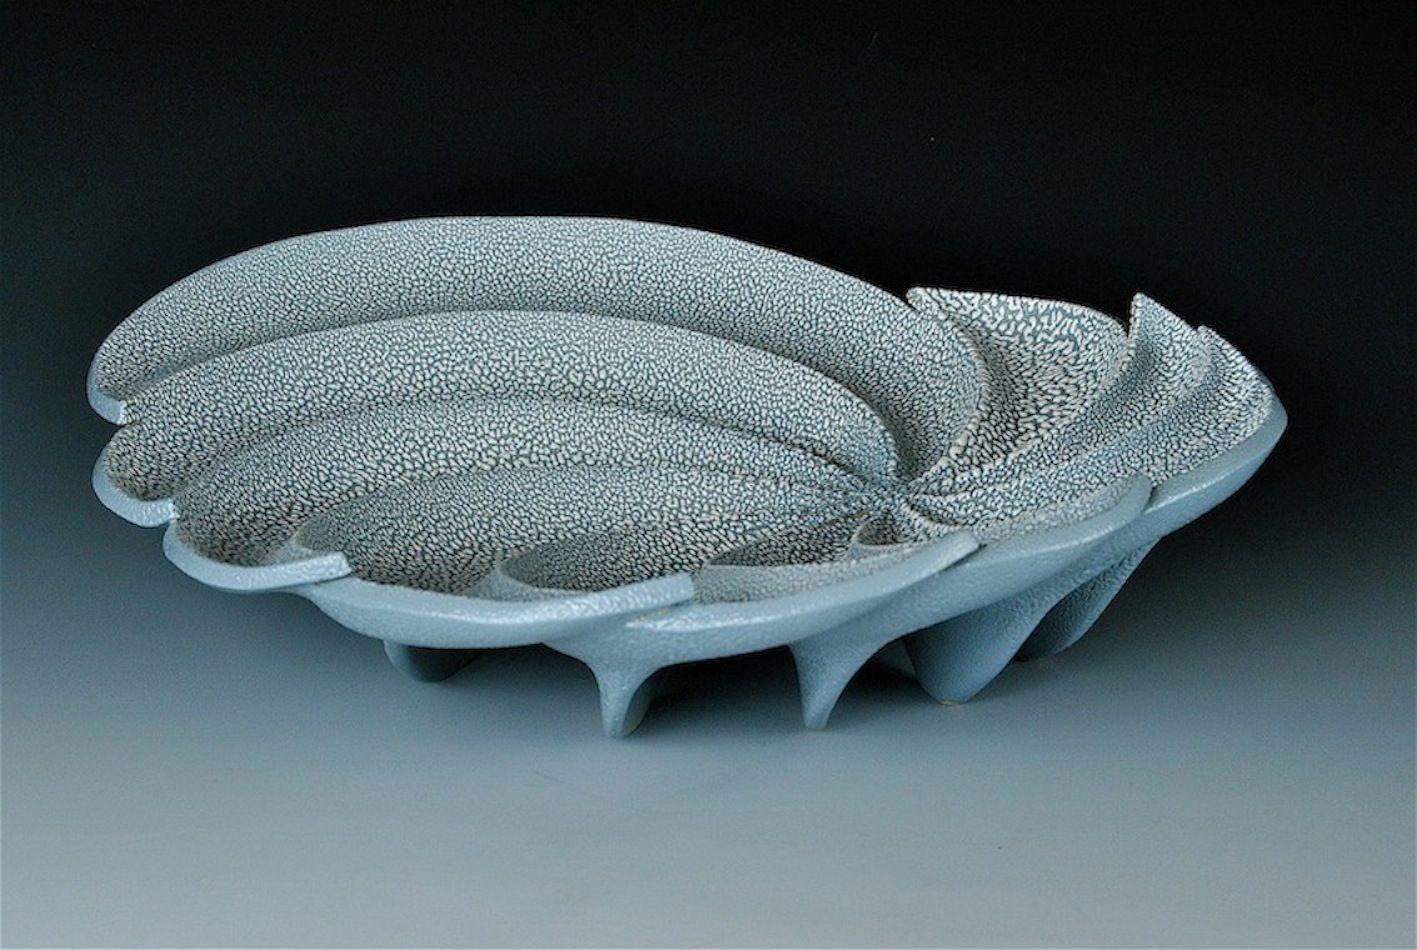 Riet bakker ceramic surfaces pinterest sculpture art